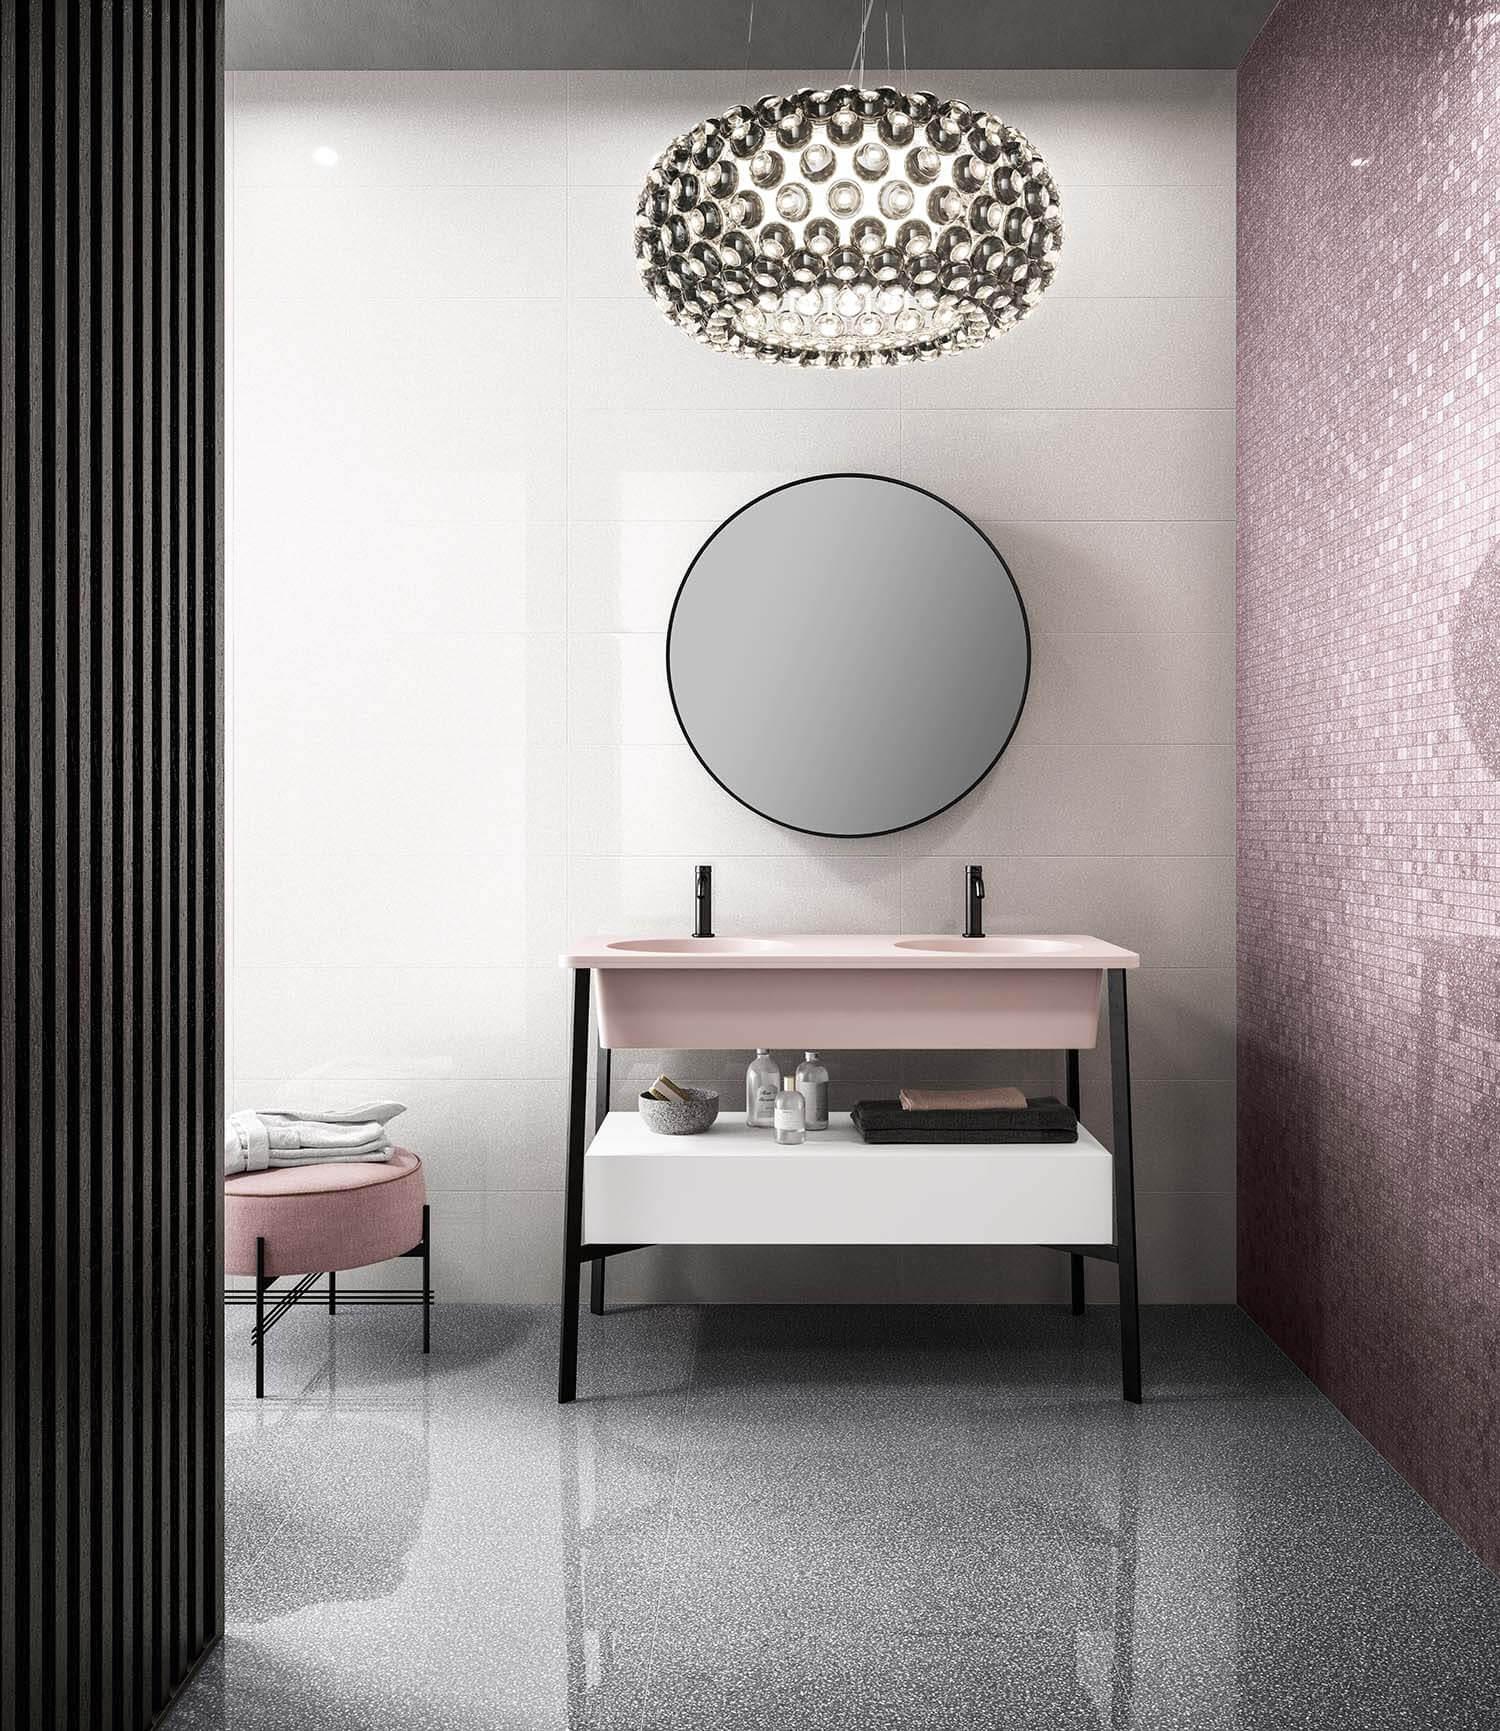 CSA_NEWDOT_Dotmosaic Mauve-Newdot Milk-Dotfloor Graphite 6060 Kry_bathroom